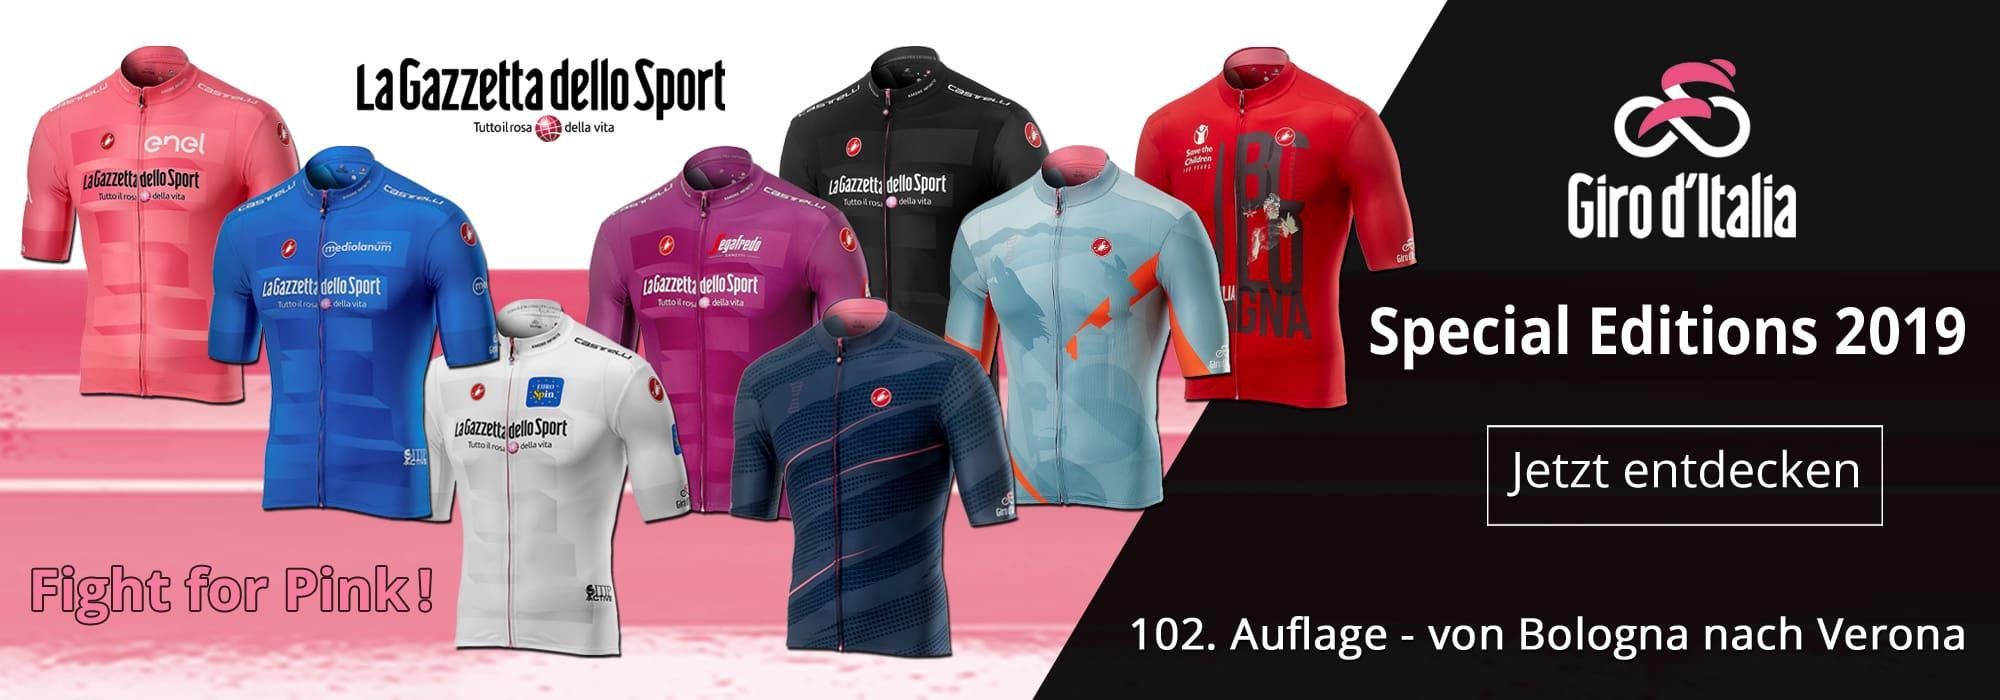 Limitierte Giro d'Italia 2019 Special Editions